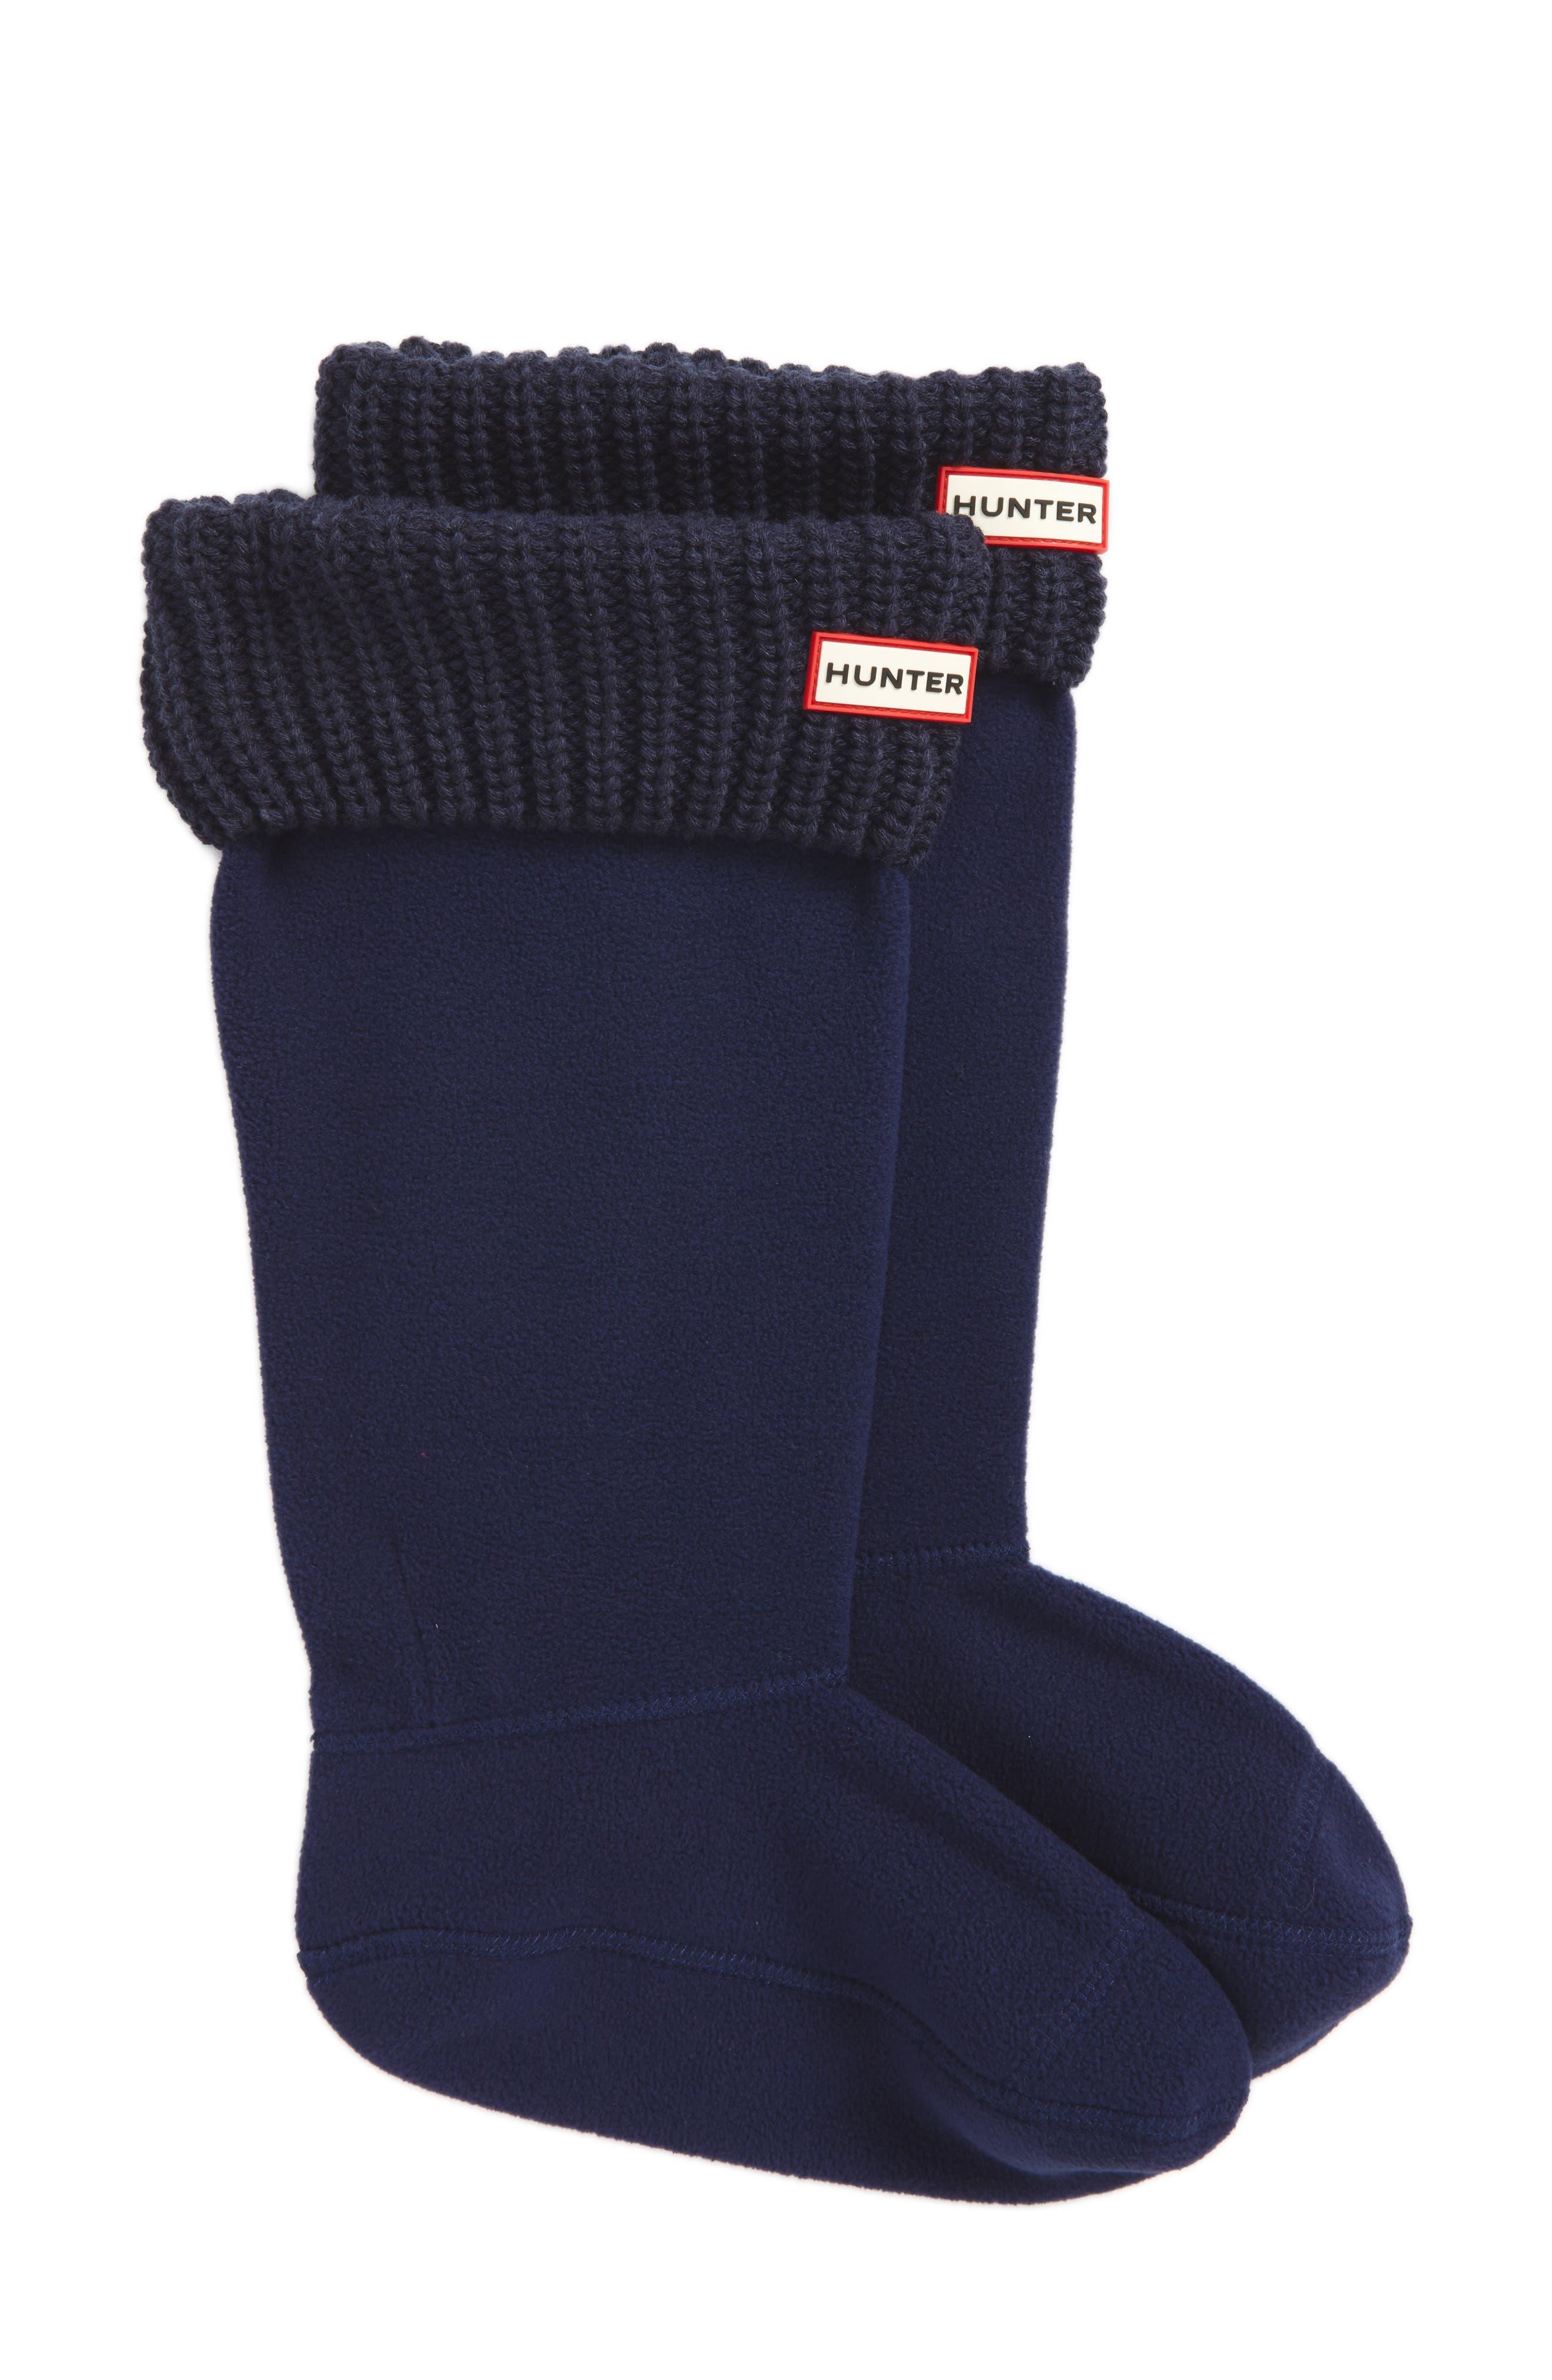 Tall Cardigan Knit Cuff Welly Boot Socks,                             Main thumbnail 1, color,                             400